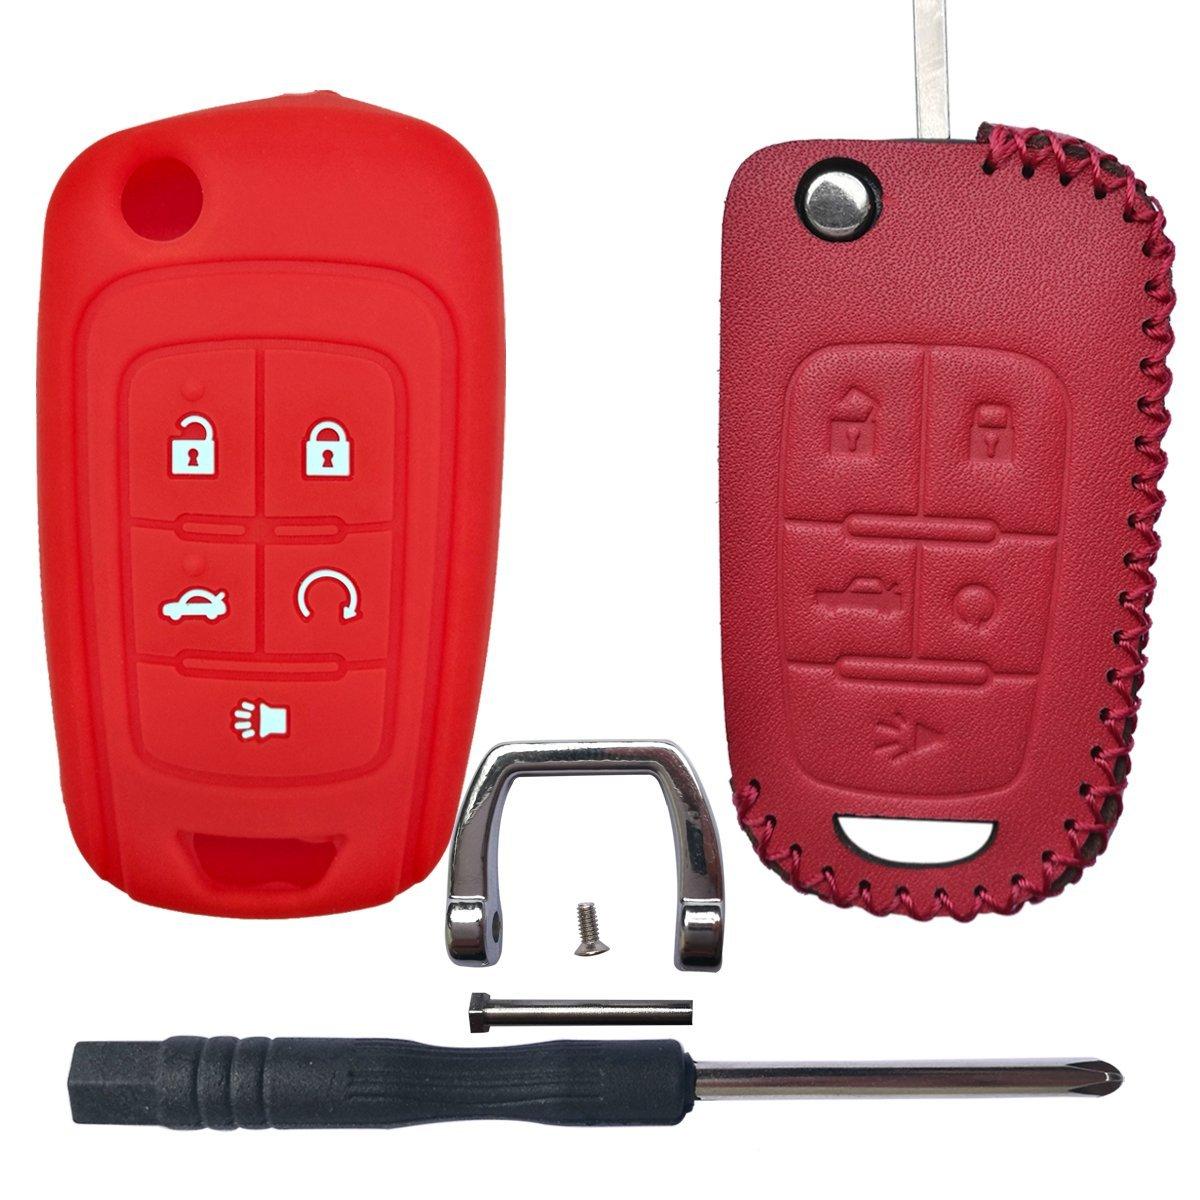 2Pcs Coolbestda Silicone Flip Key Fob Remote Cover Case Skin Keyless Jacket Holder Protector for Chevrolet Equinox Camaro Cruze Malibu Sonic Volt Park